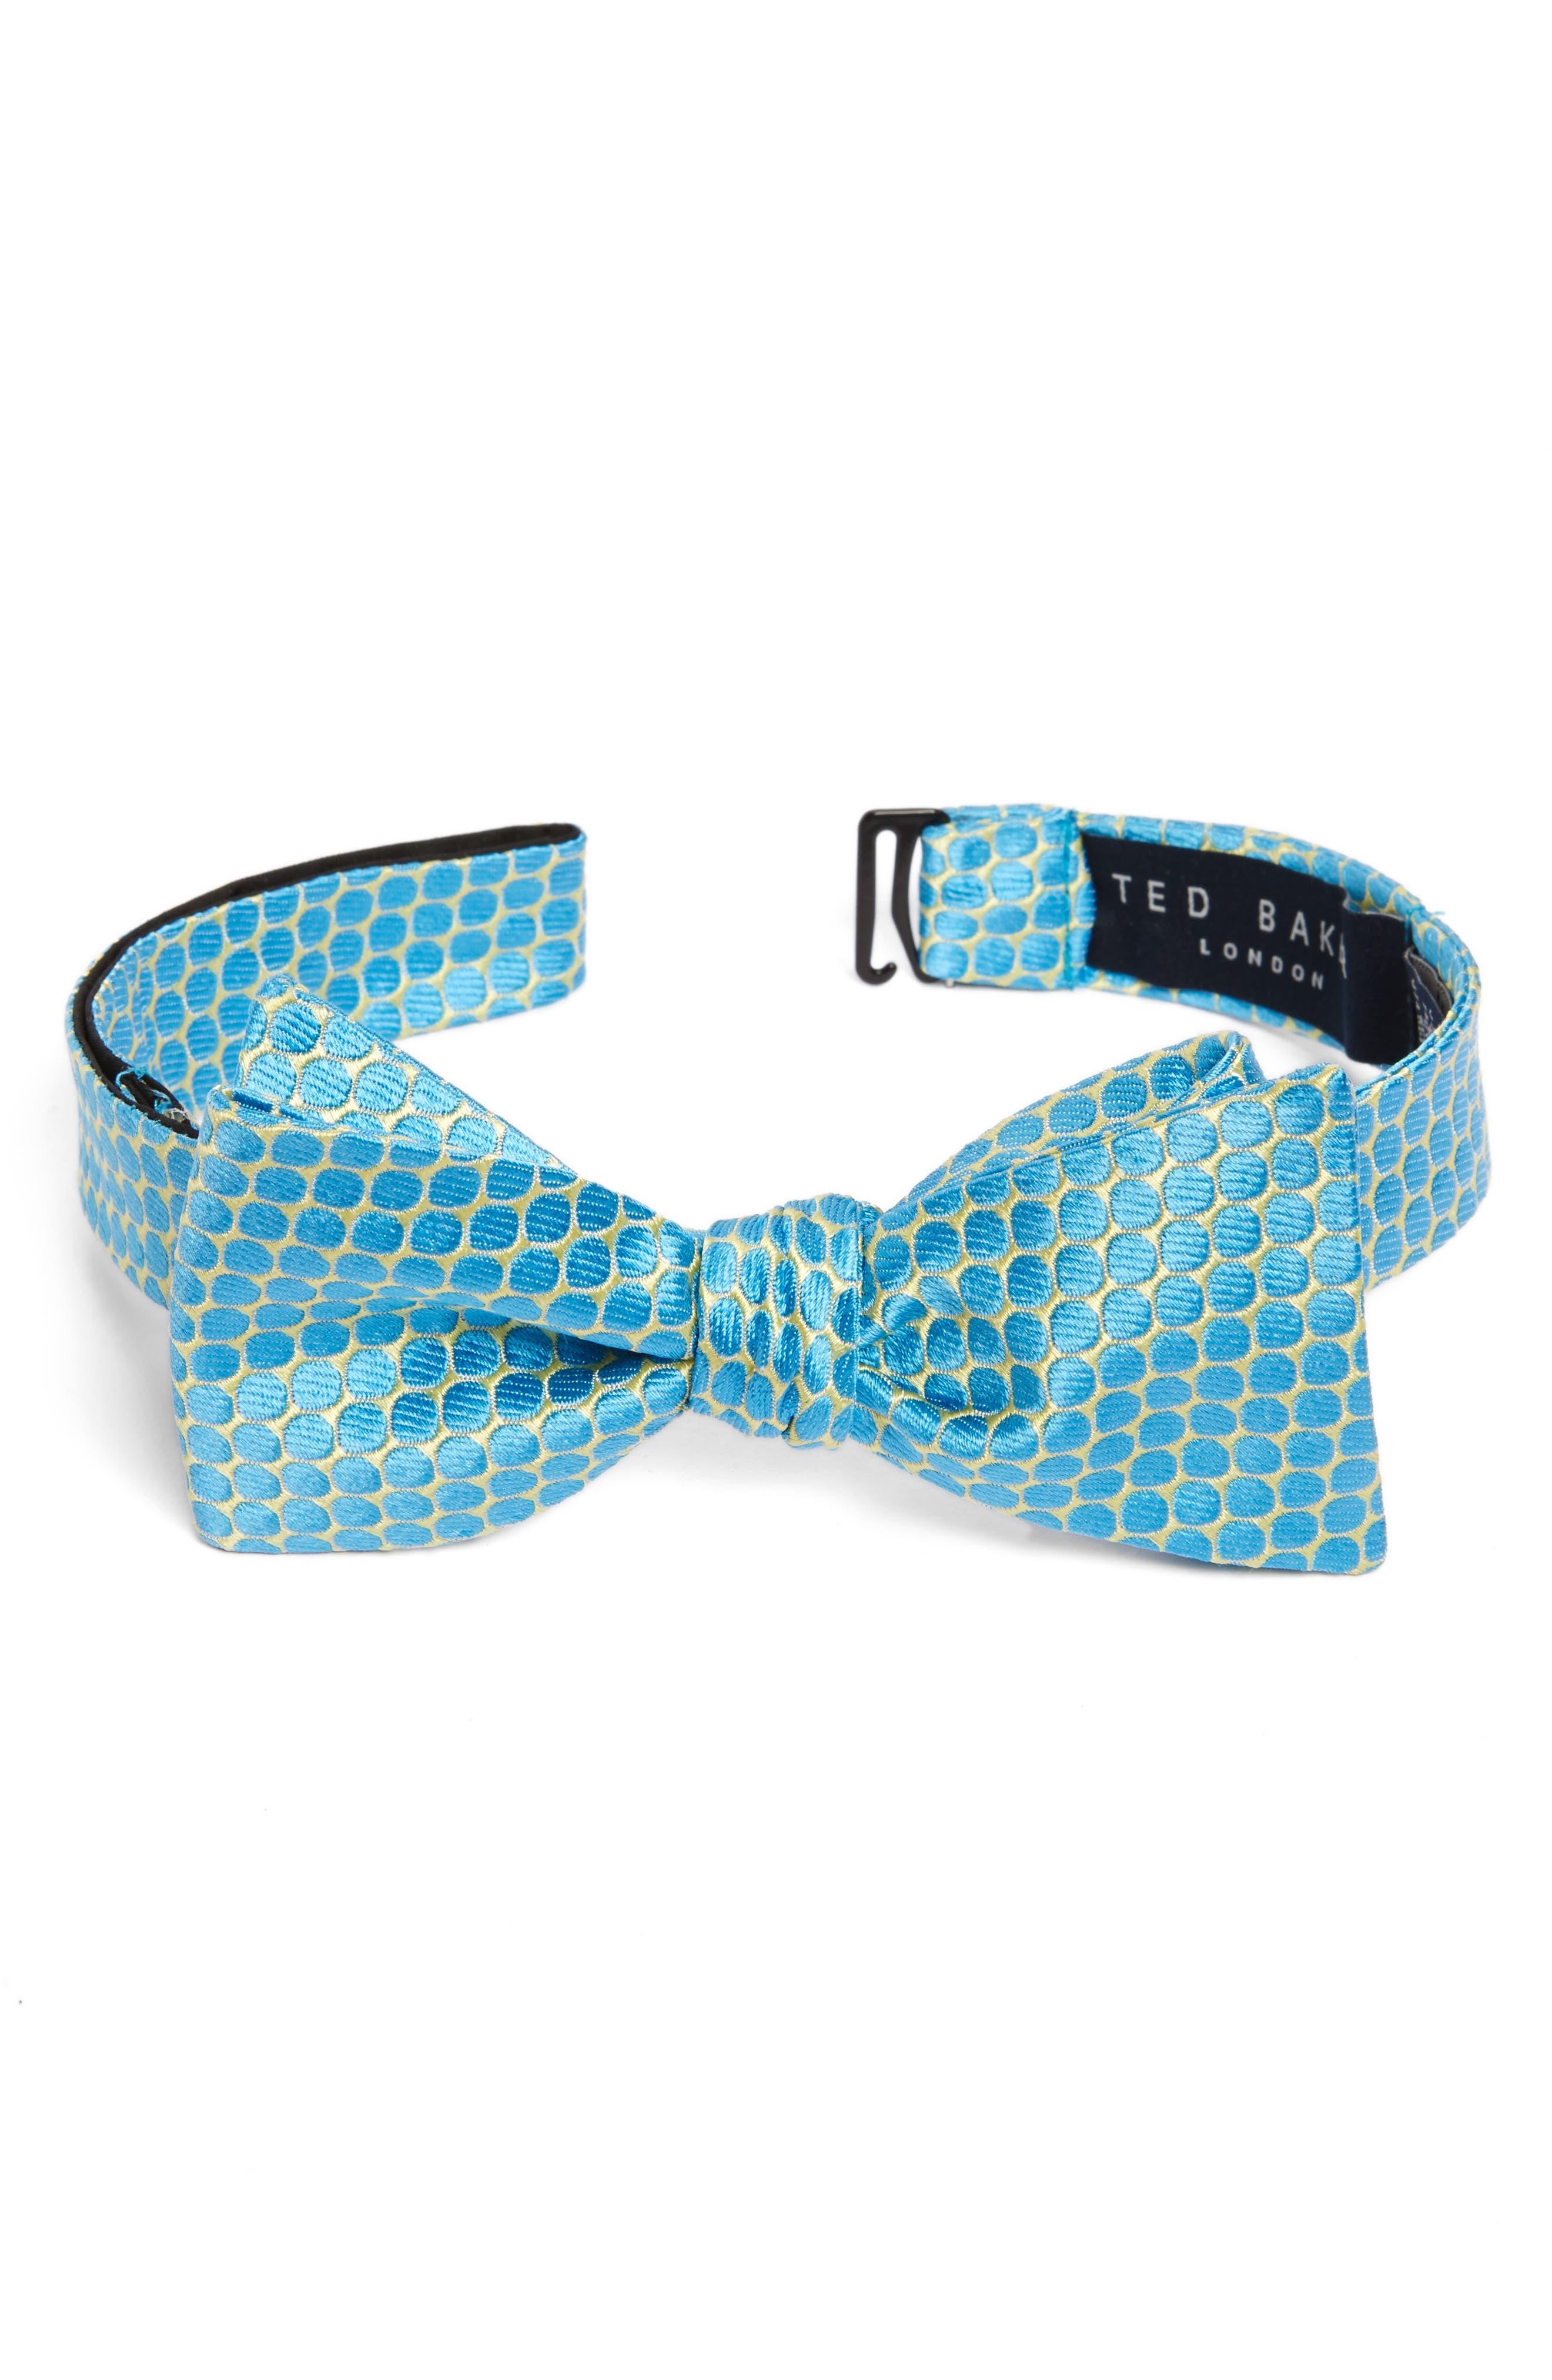 TED BAKER LONDON Microdot Silk Tie